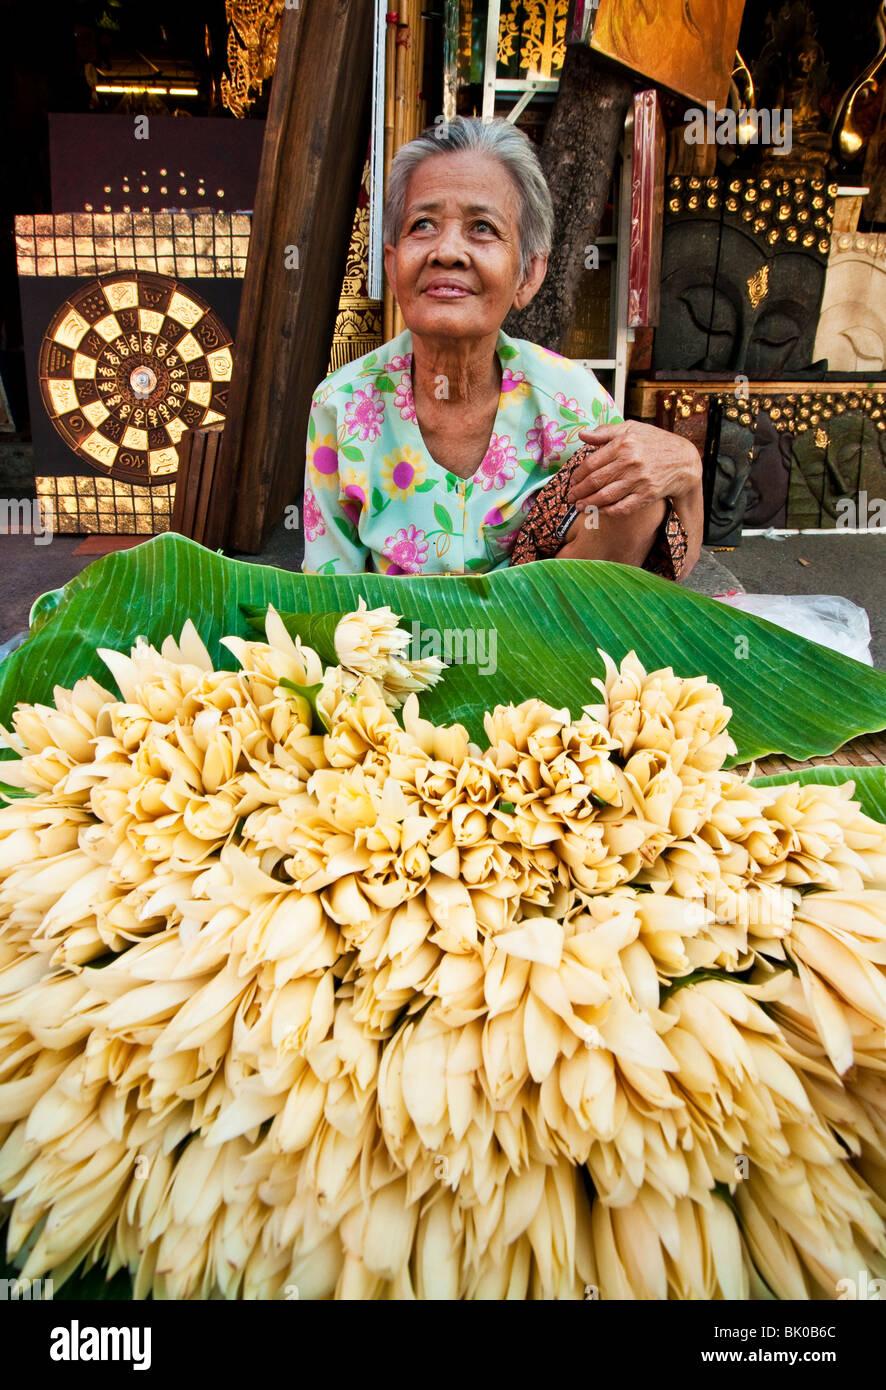 Woman selling flowers in Chatuchak Weekend Market in Bangkok, Thailand. - Stock Image